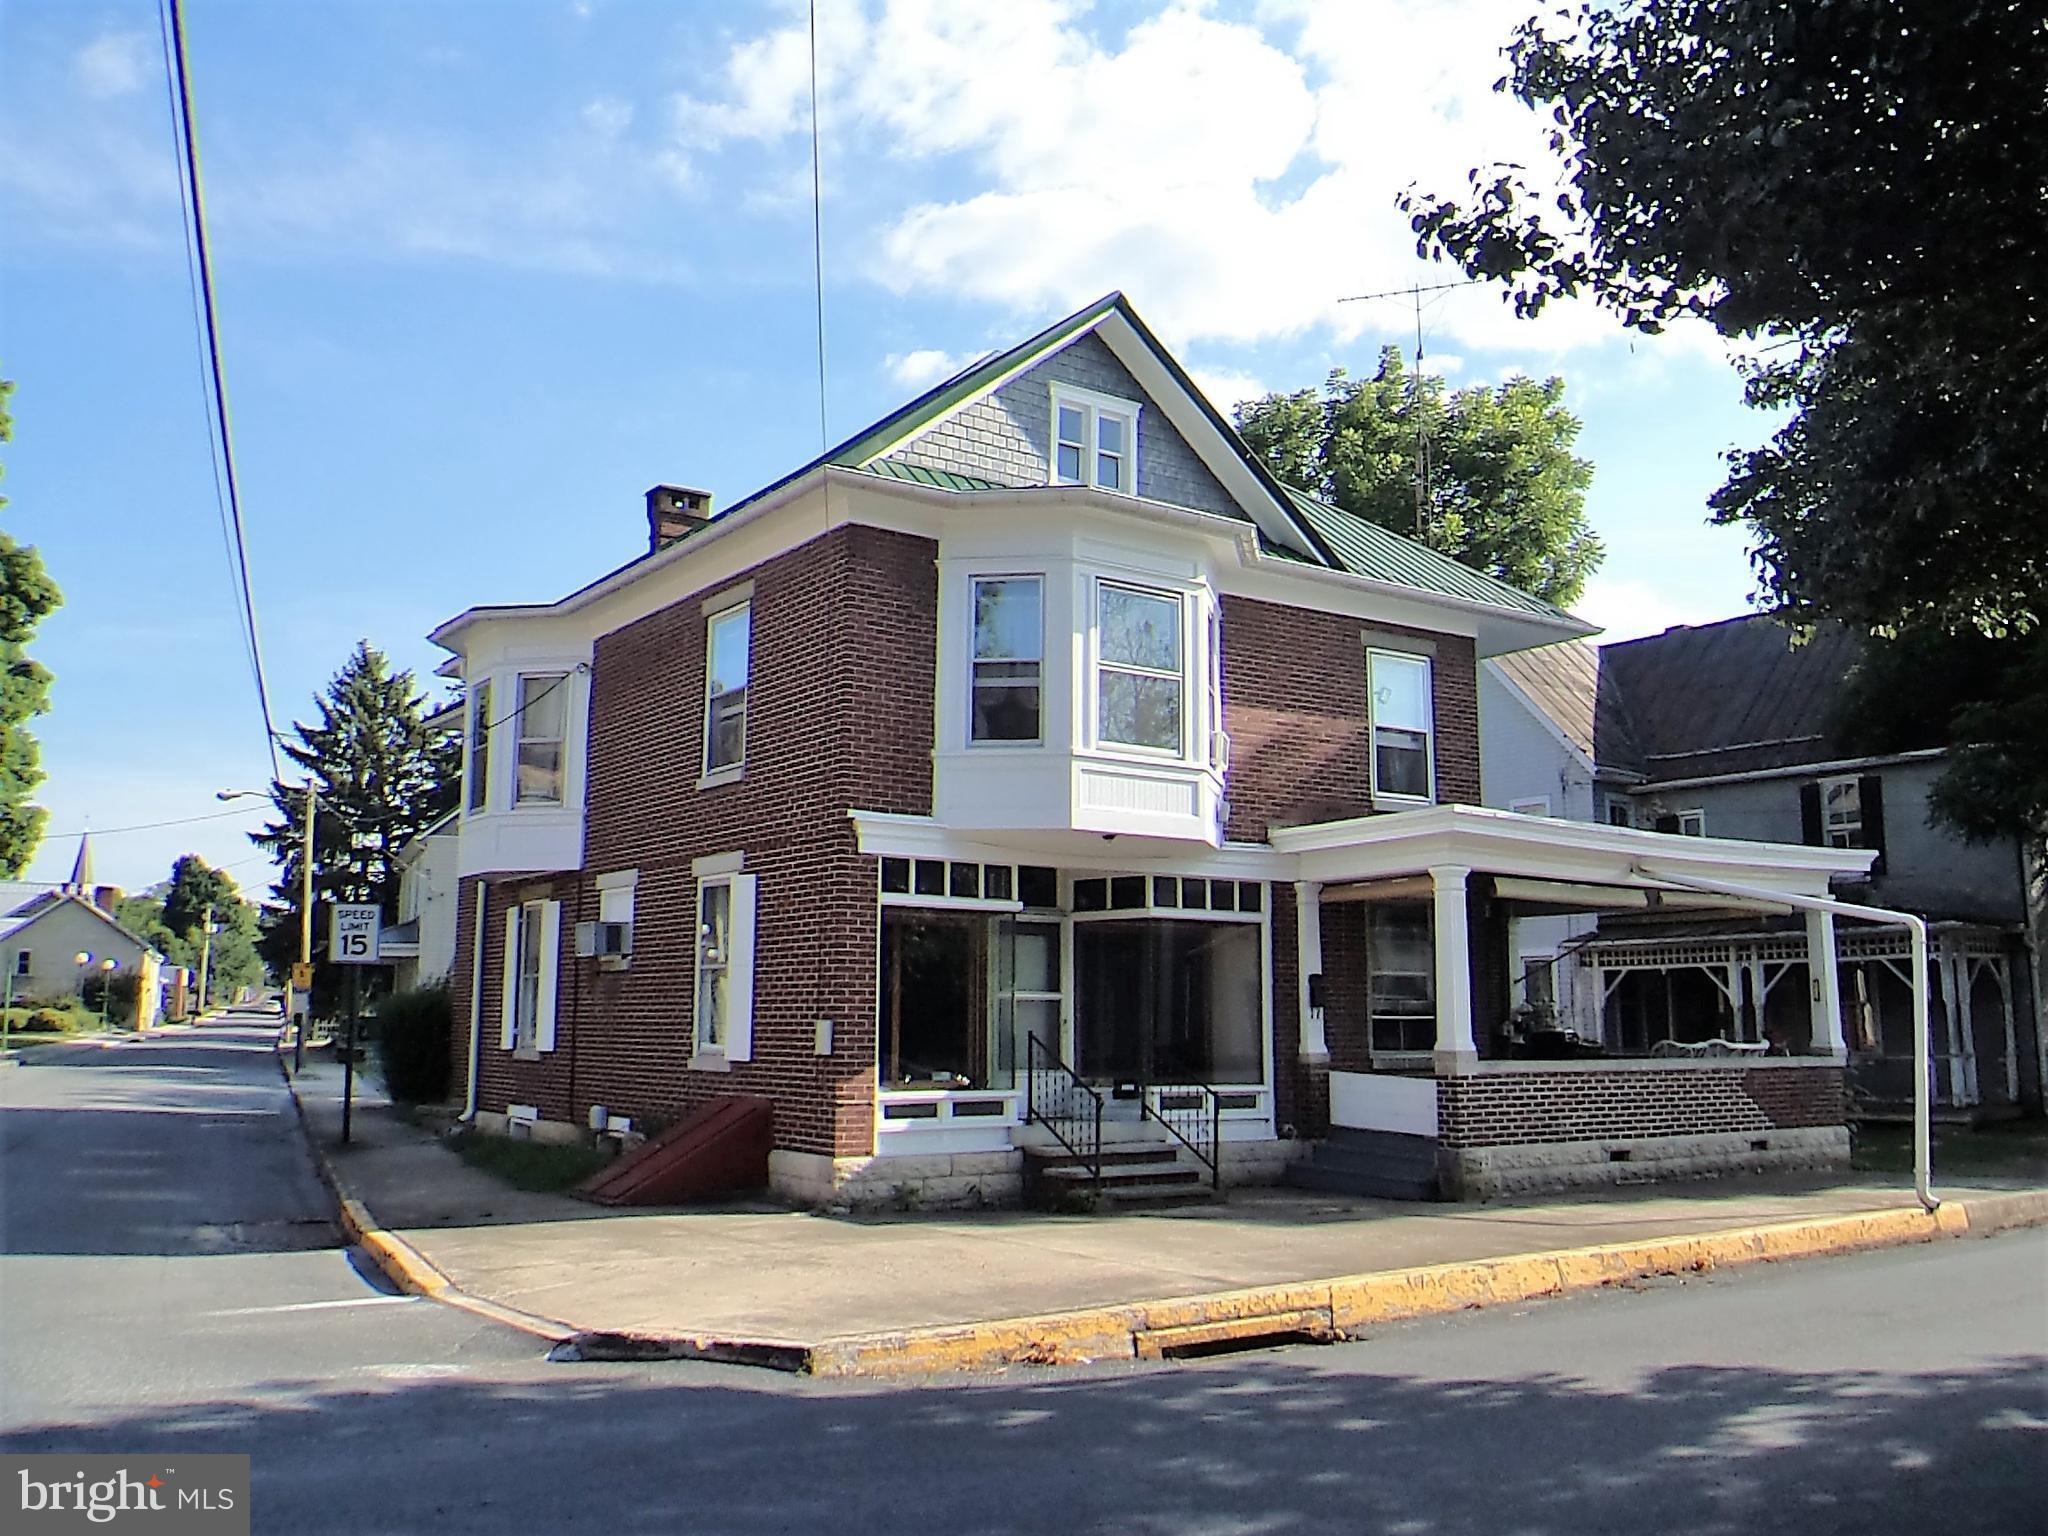 32 OREGON STREET, MERCERSBURG, PA 17236